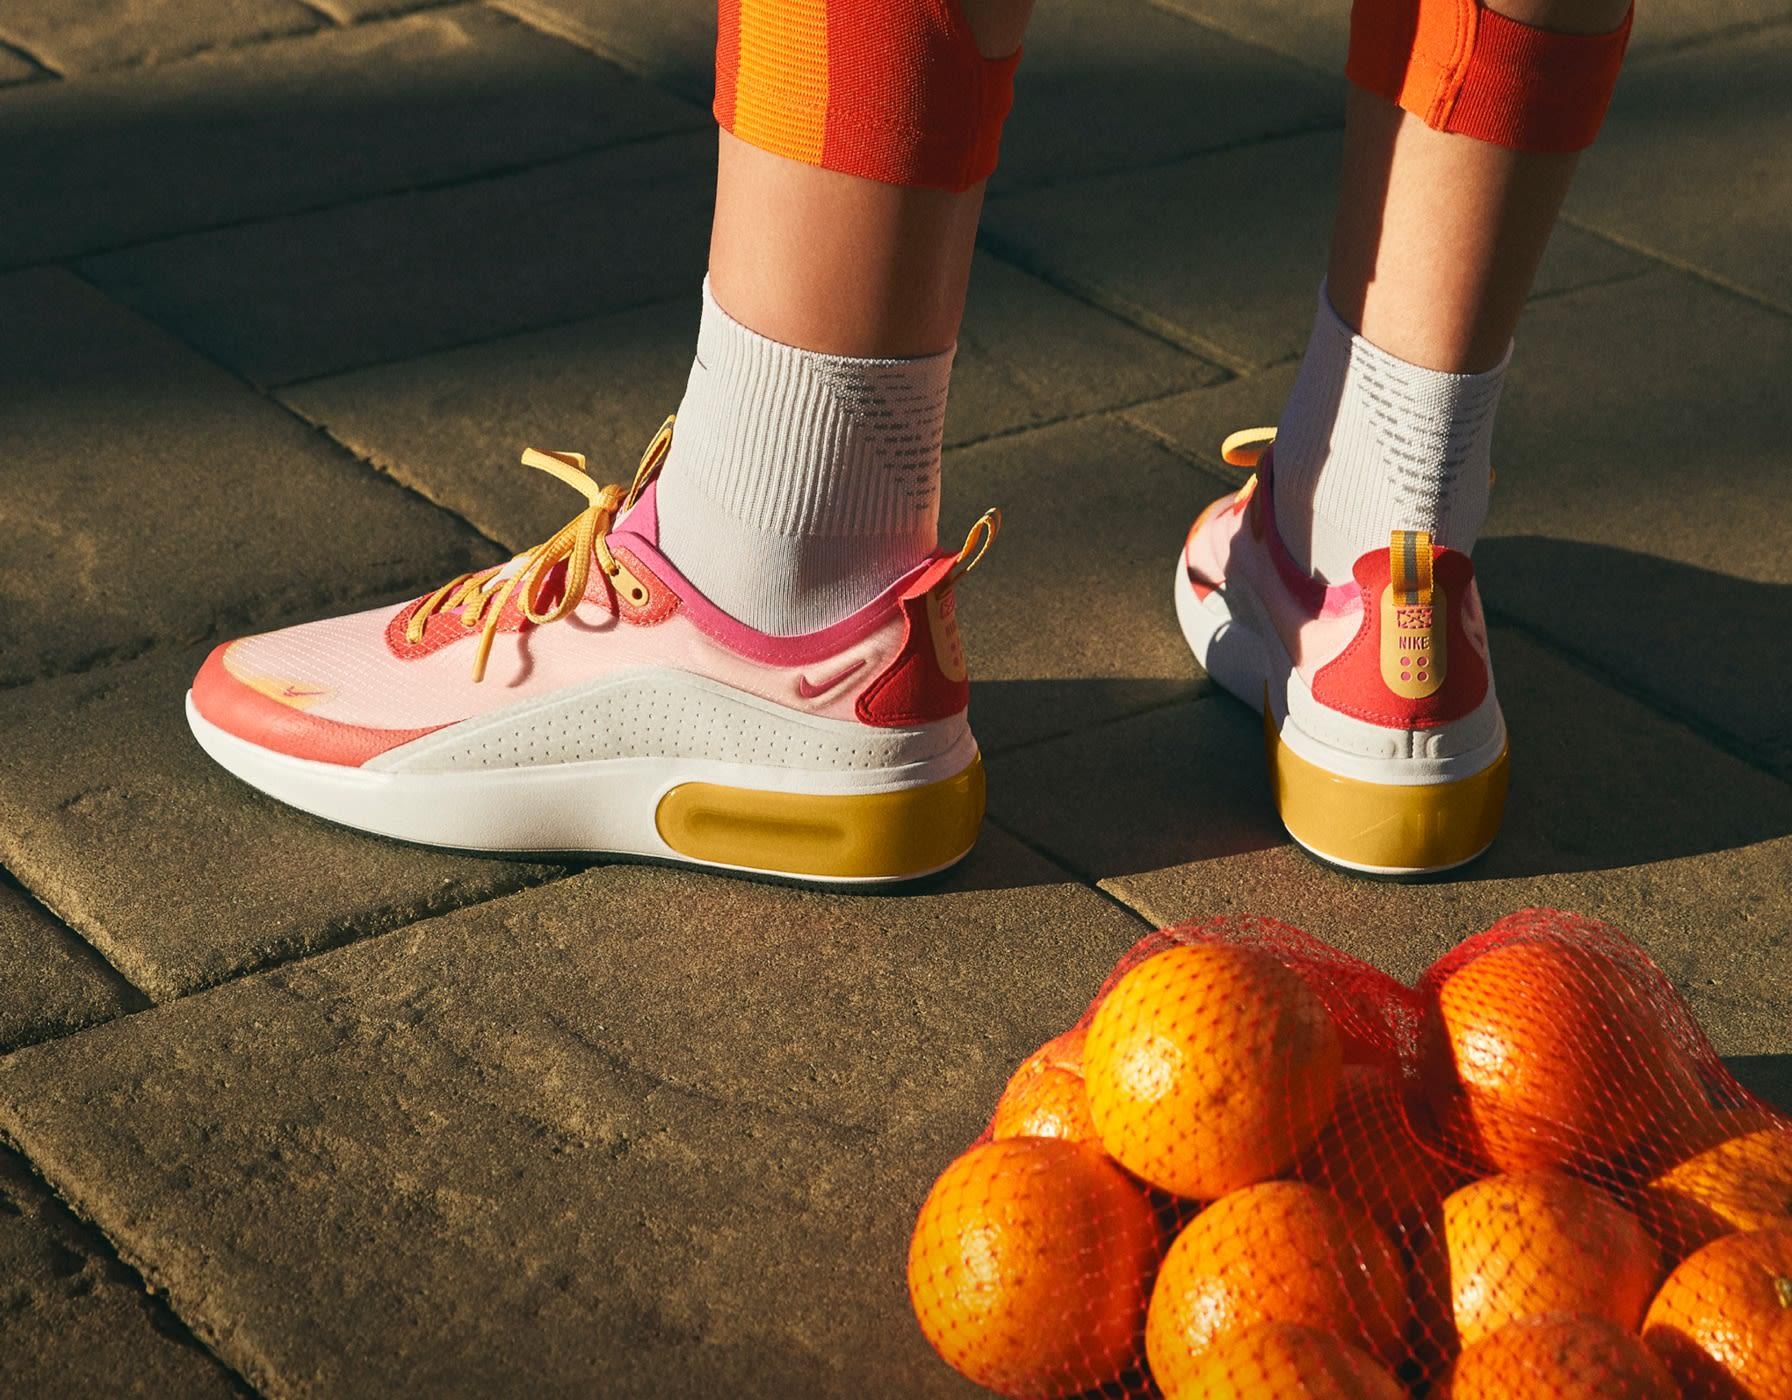 new arrival d9d4b 12865 Nike. Just Do It. Nike.com